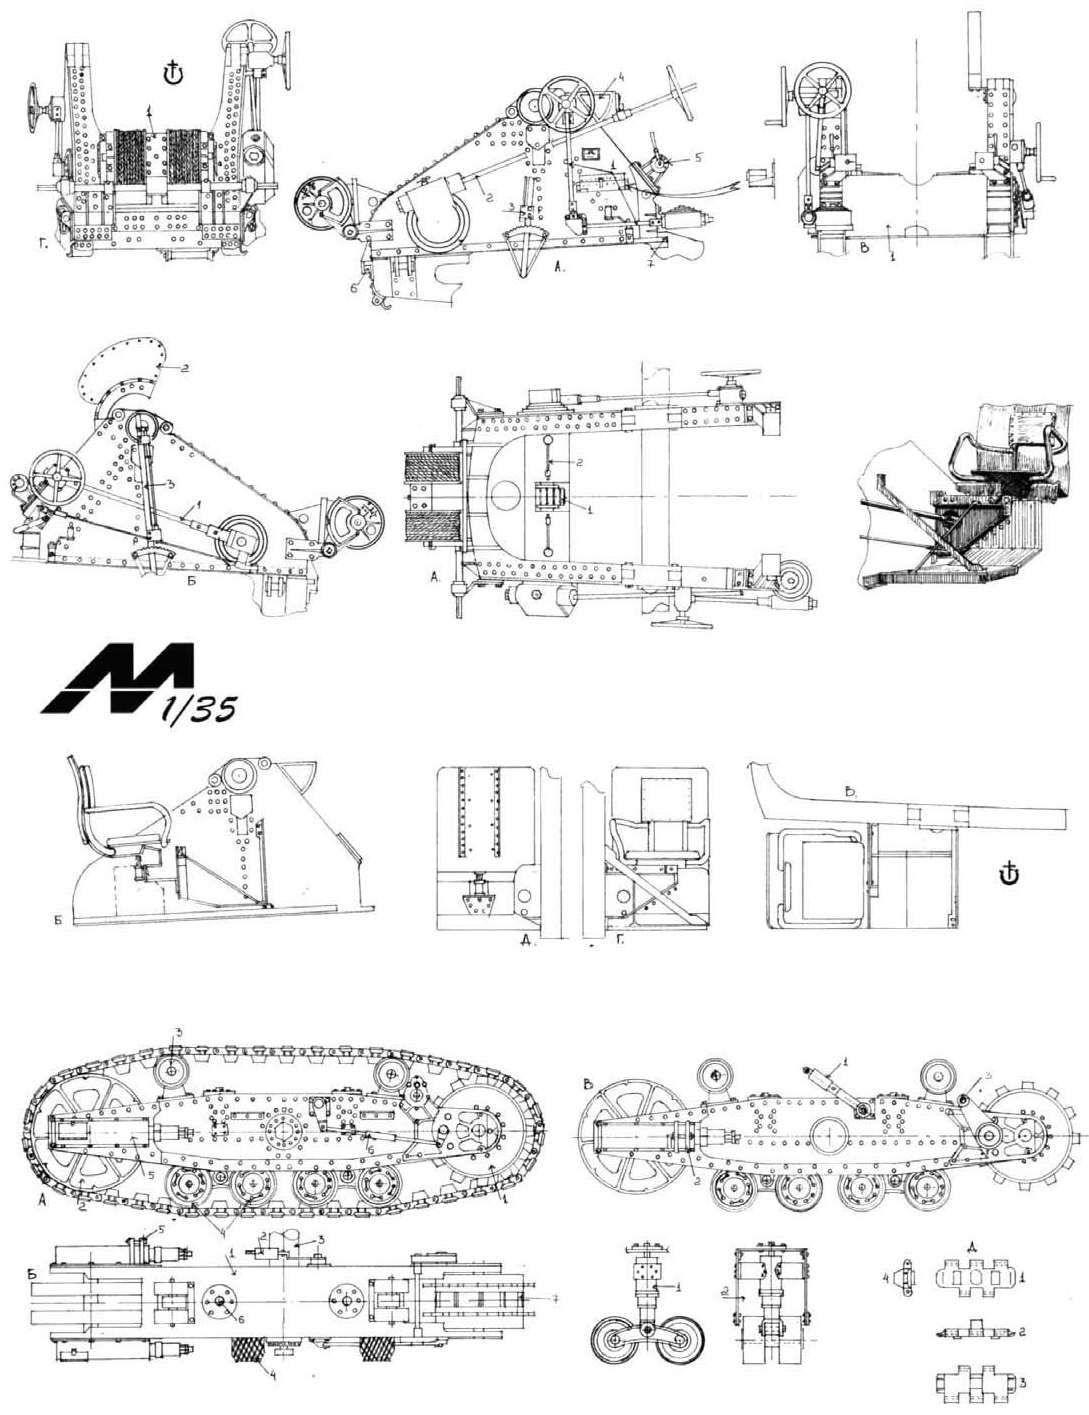 203 mm howitzer M1931 (B-4) blueprint